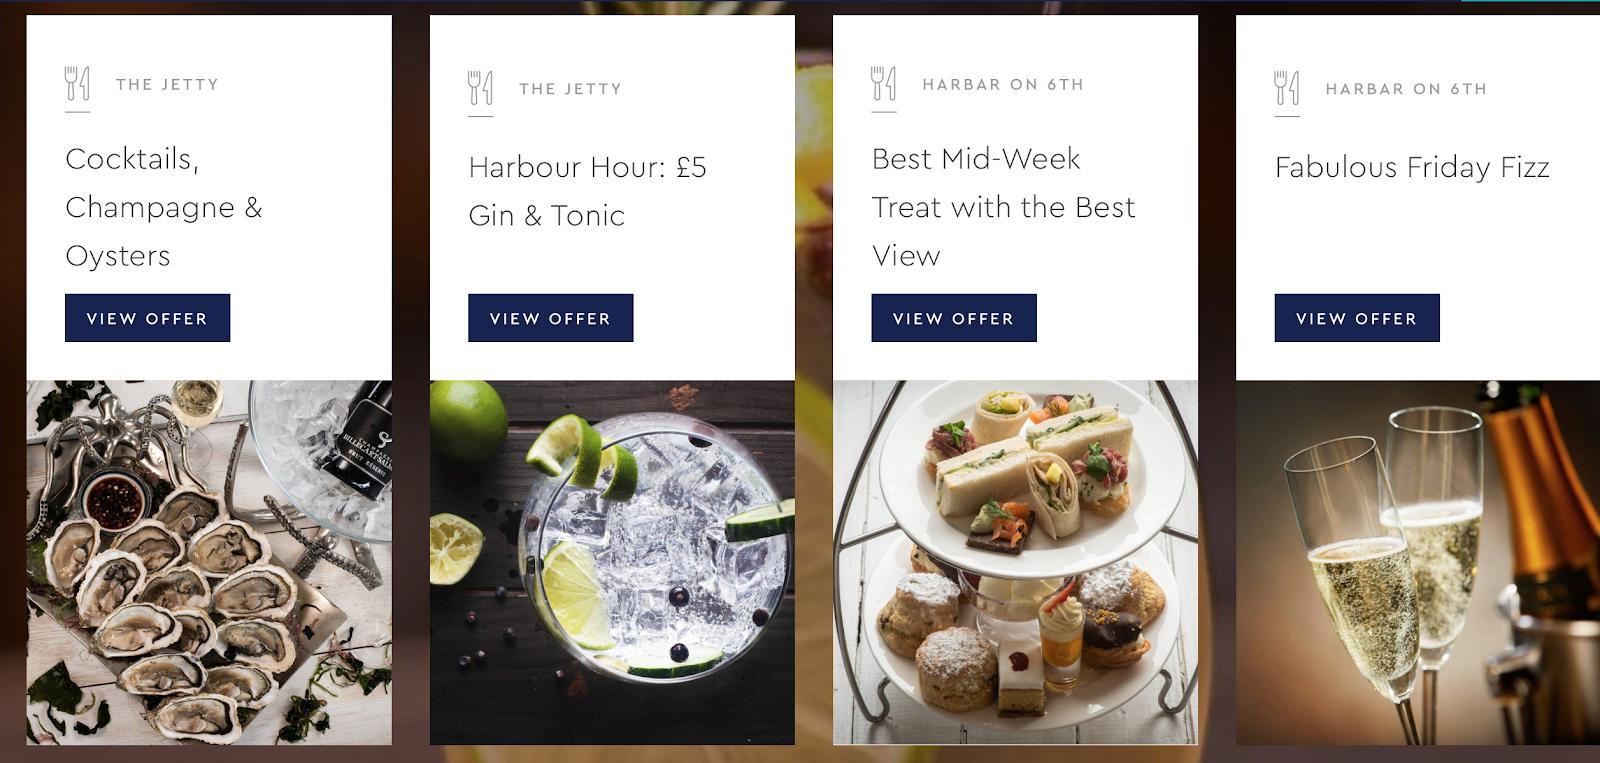 https://www.harbourhotels.co.uk/southampton/eat-and-drink?gclid=Cj0KCQjwi7DtBRCLARIsAGCJWBpUvrEL7NUdTCpQ_giLN-PEXMZwdCnZ3Yxm73cxqGQ6QPodMGCuB9waAlXvEALw_wcB